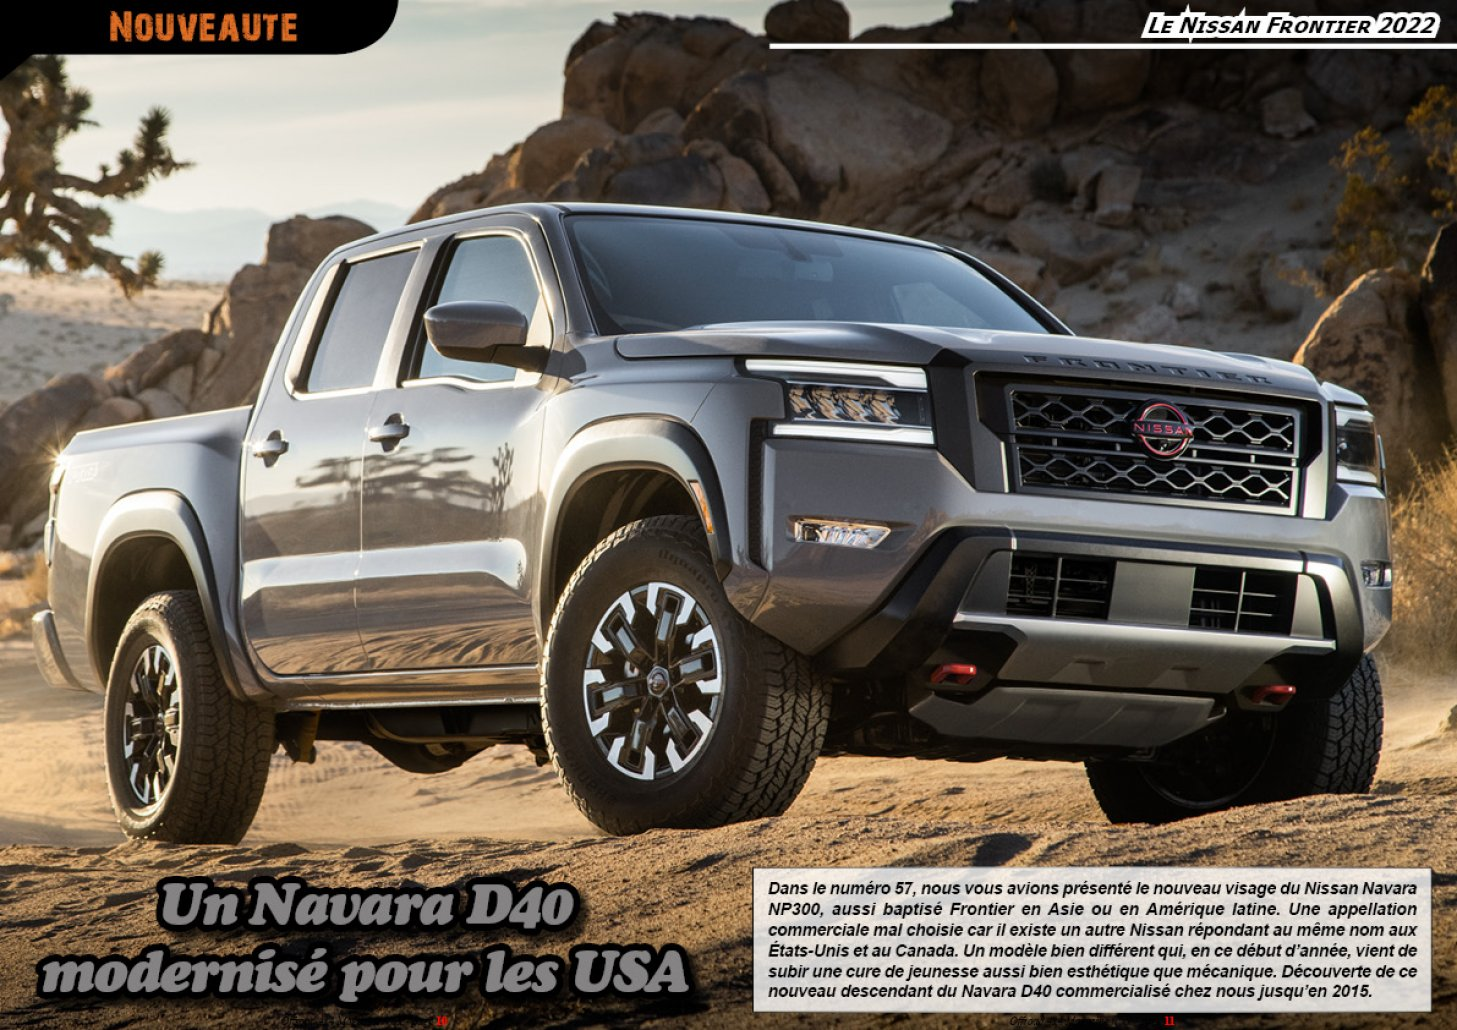 Le Nissan Frontier 2022